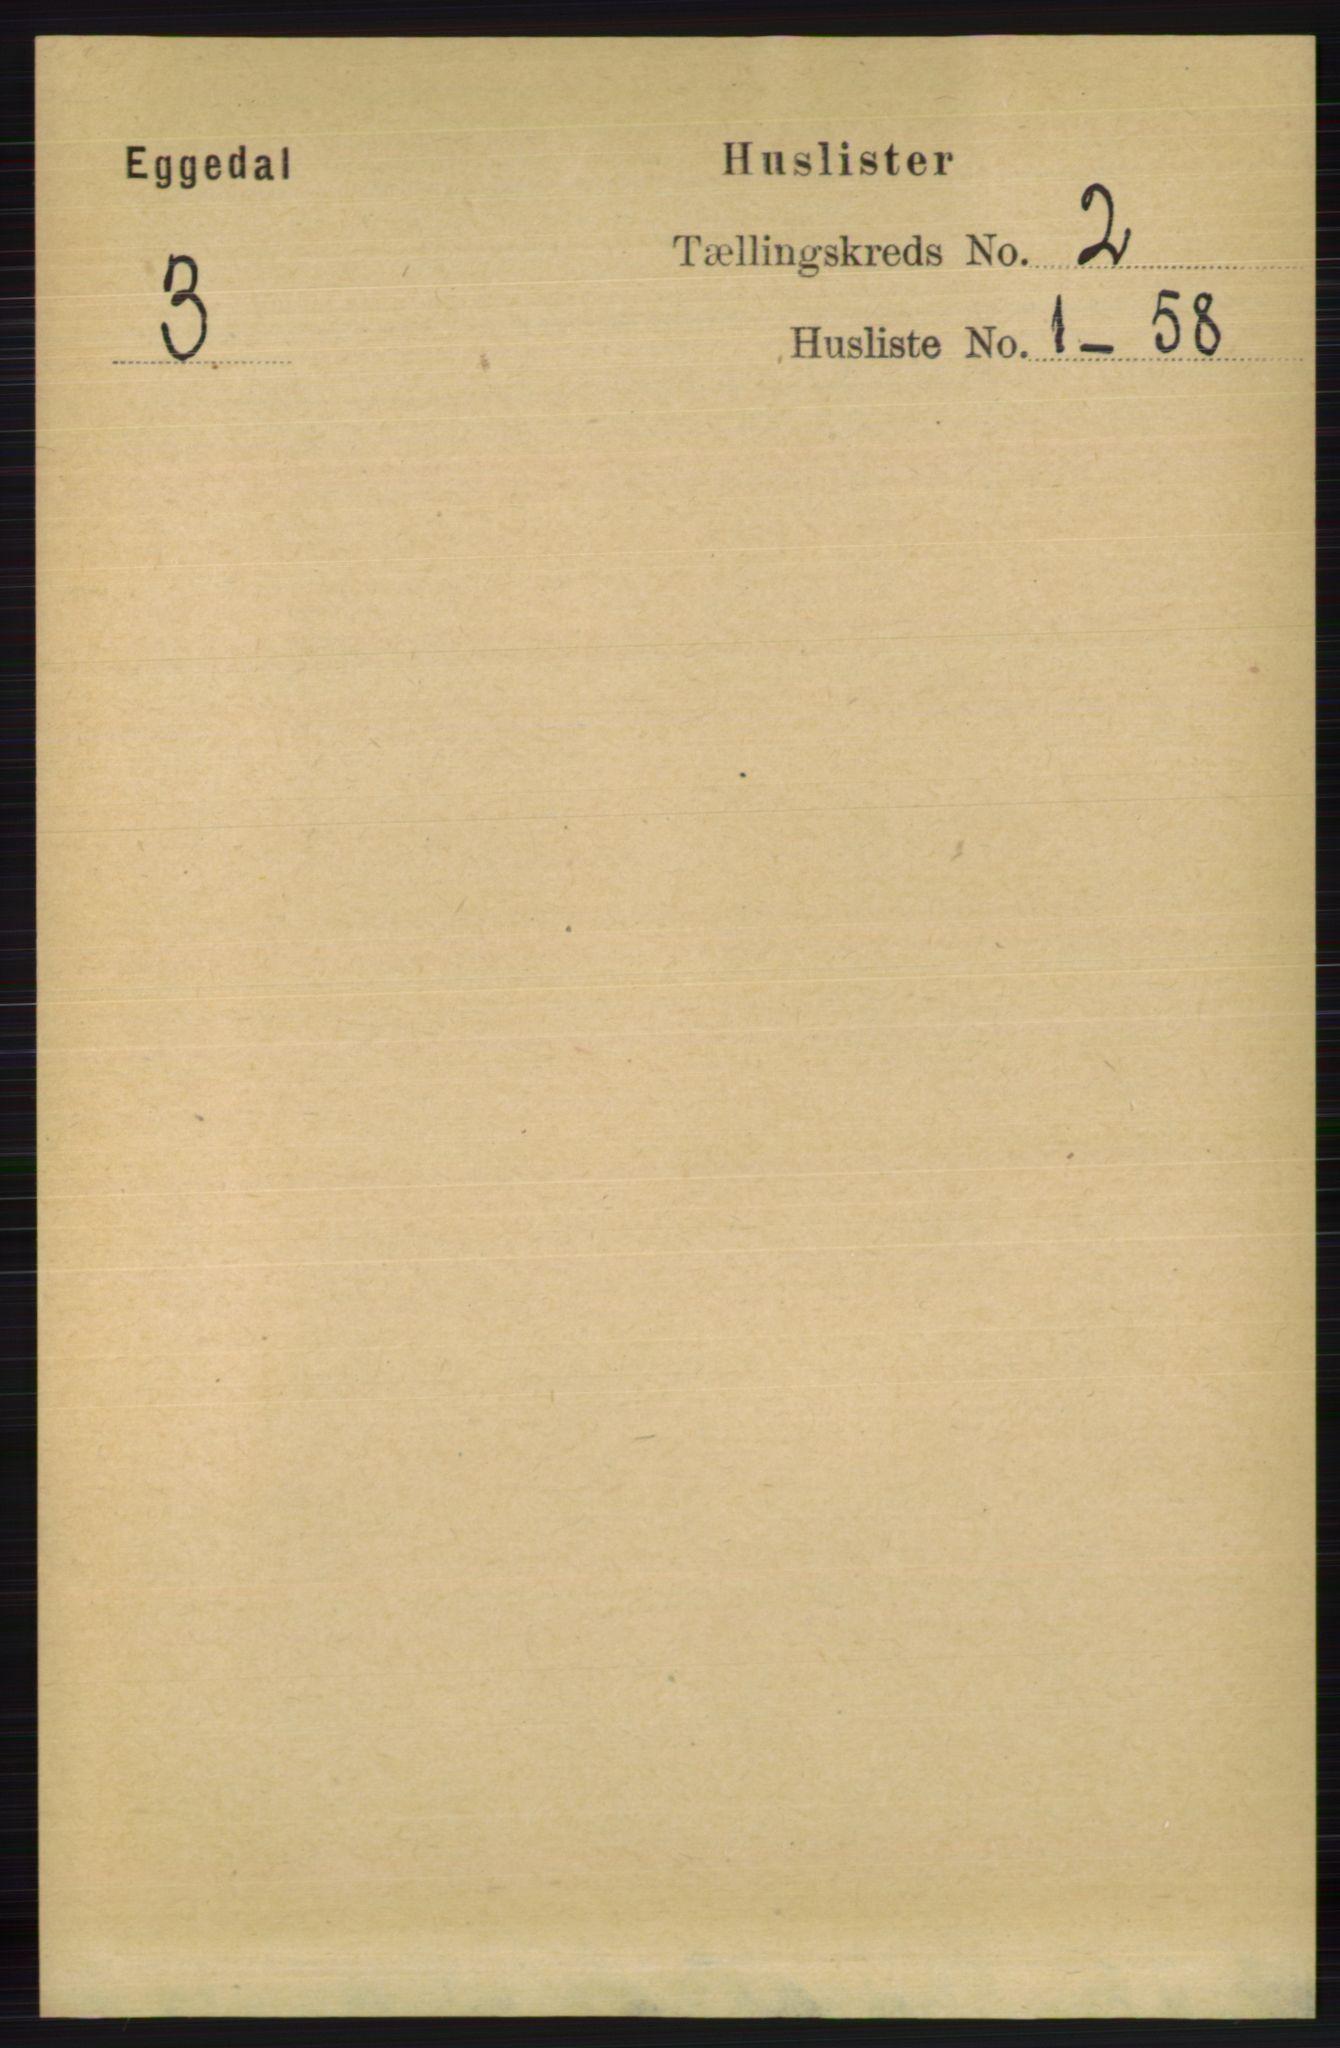 RA, Folketelling 1891 for 0621 Sigdal herred, 1891, s. 3857